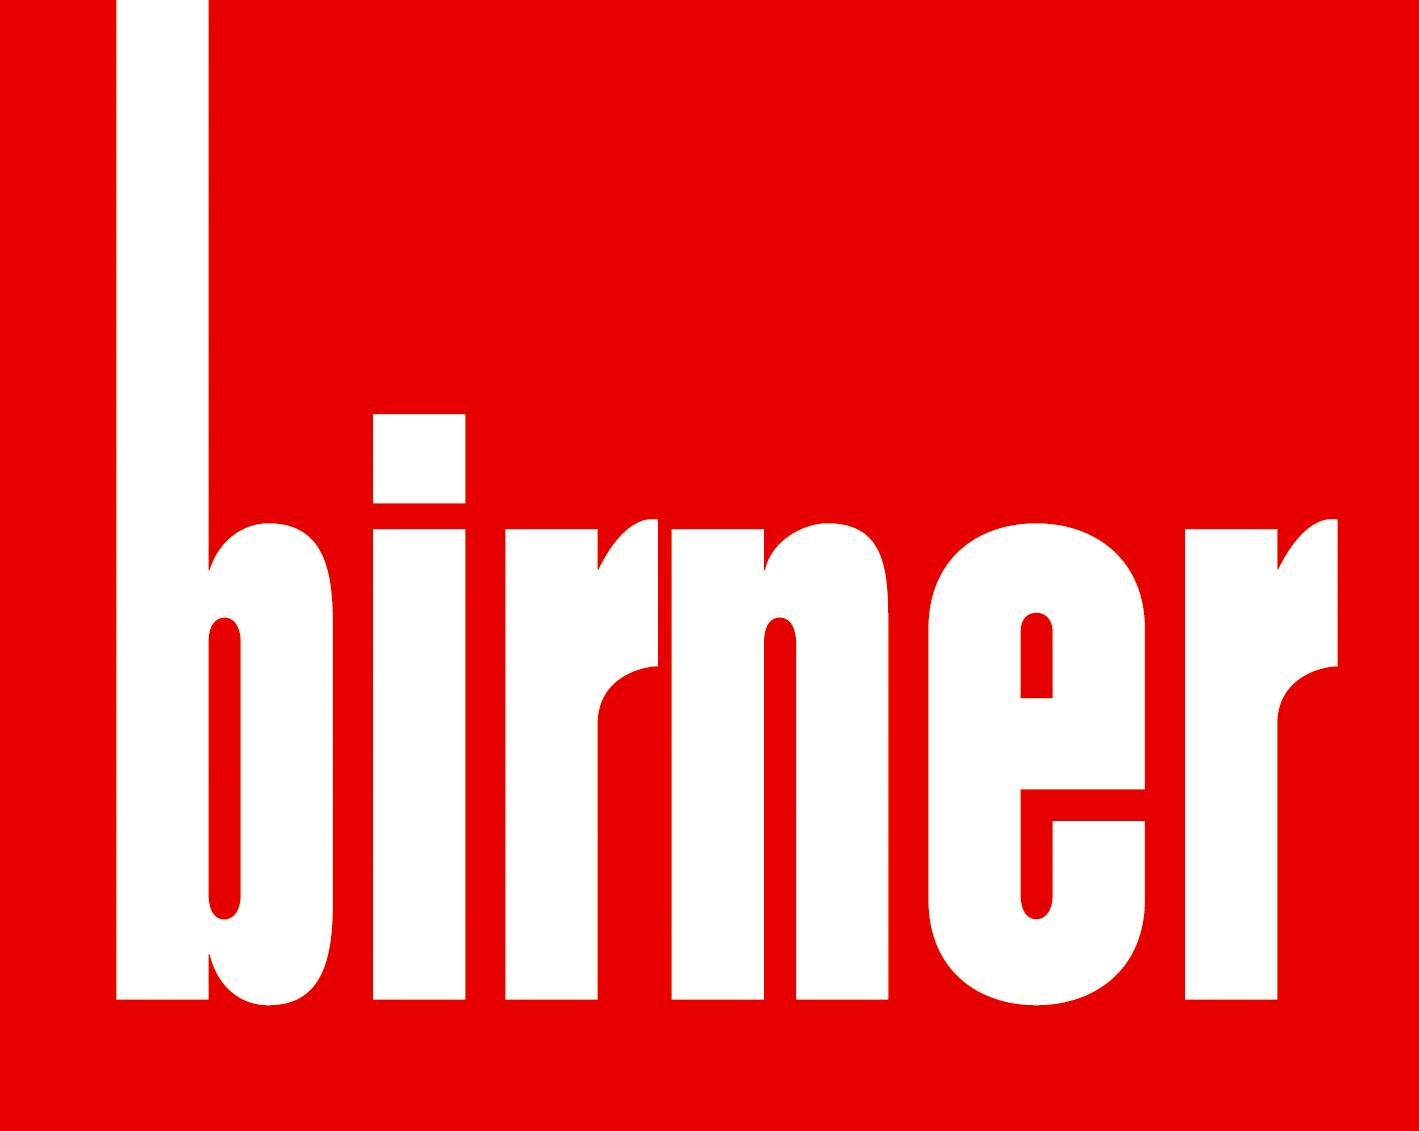 Birner Horn